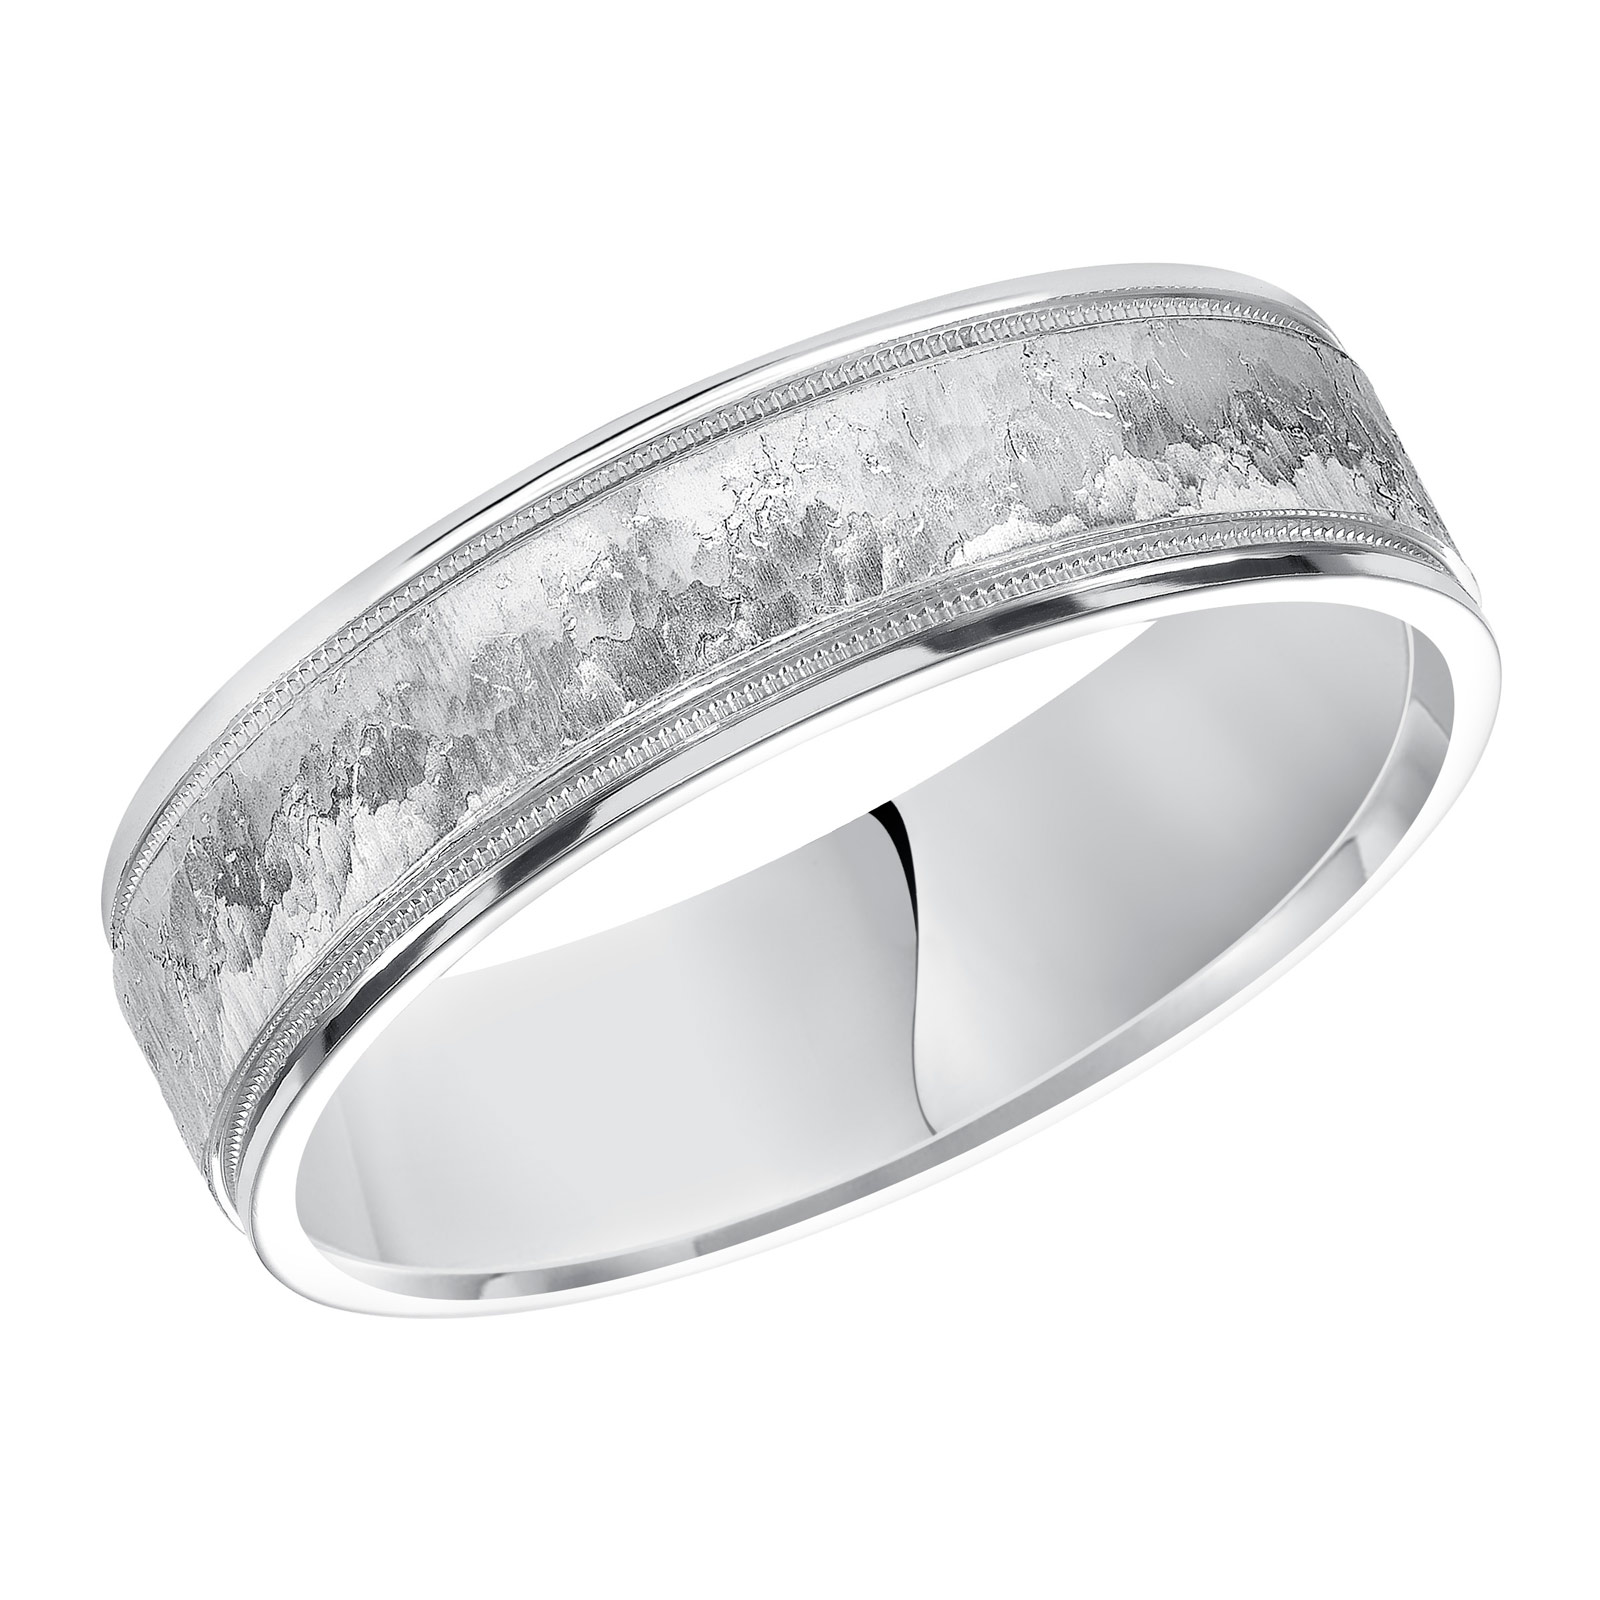 Goldman ring 11 12k4w6 g00 long island ny mens wedding for Long island wedding bands